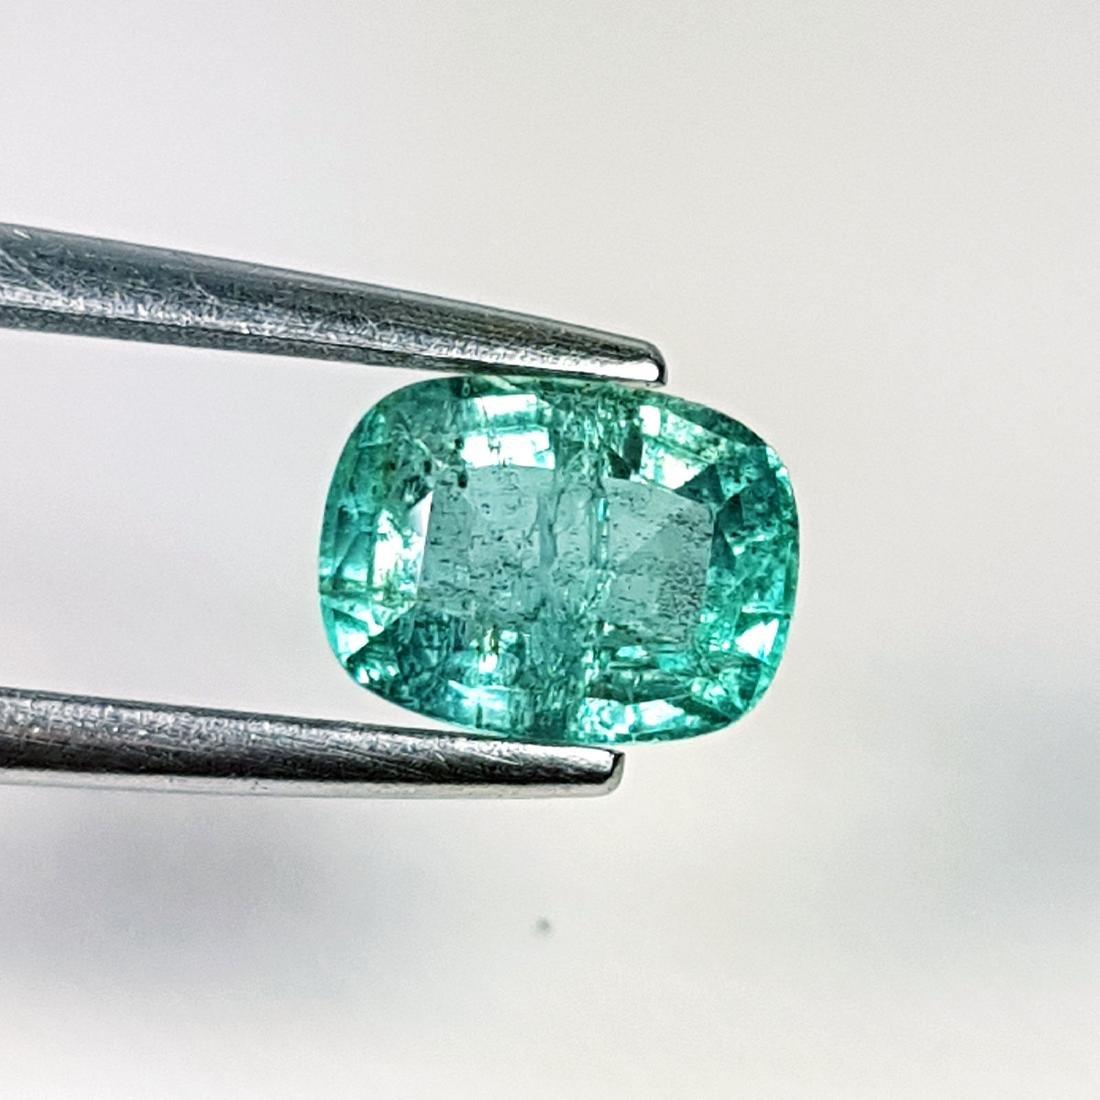 Emerald - 1.47 - 2